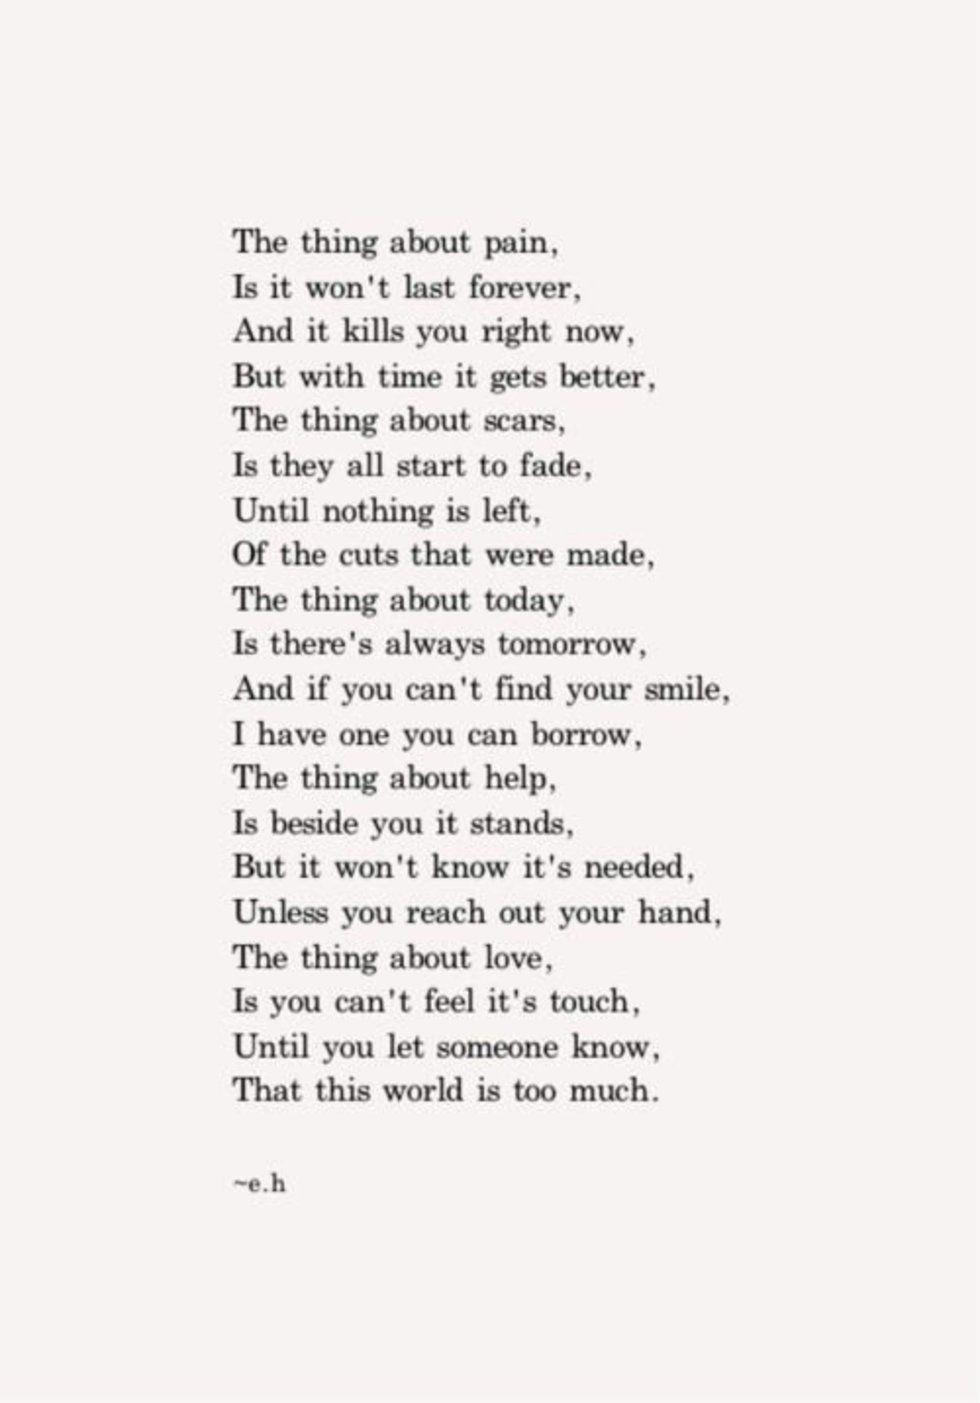 25 Of My Favorite Eh Poems Paroles Inspirantes Poeme